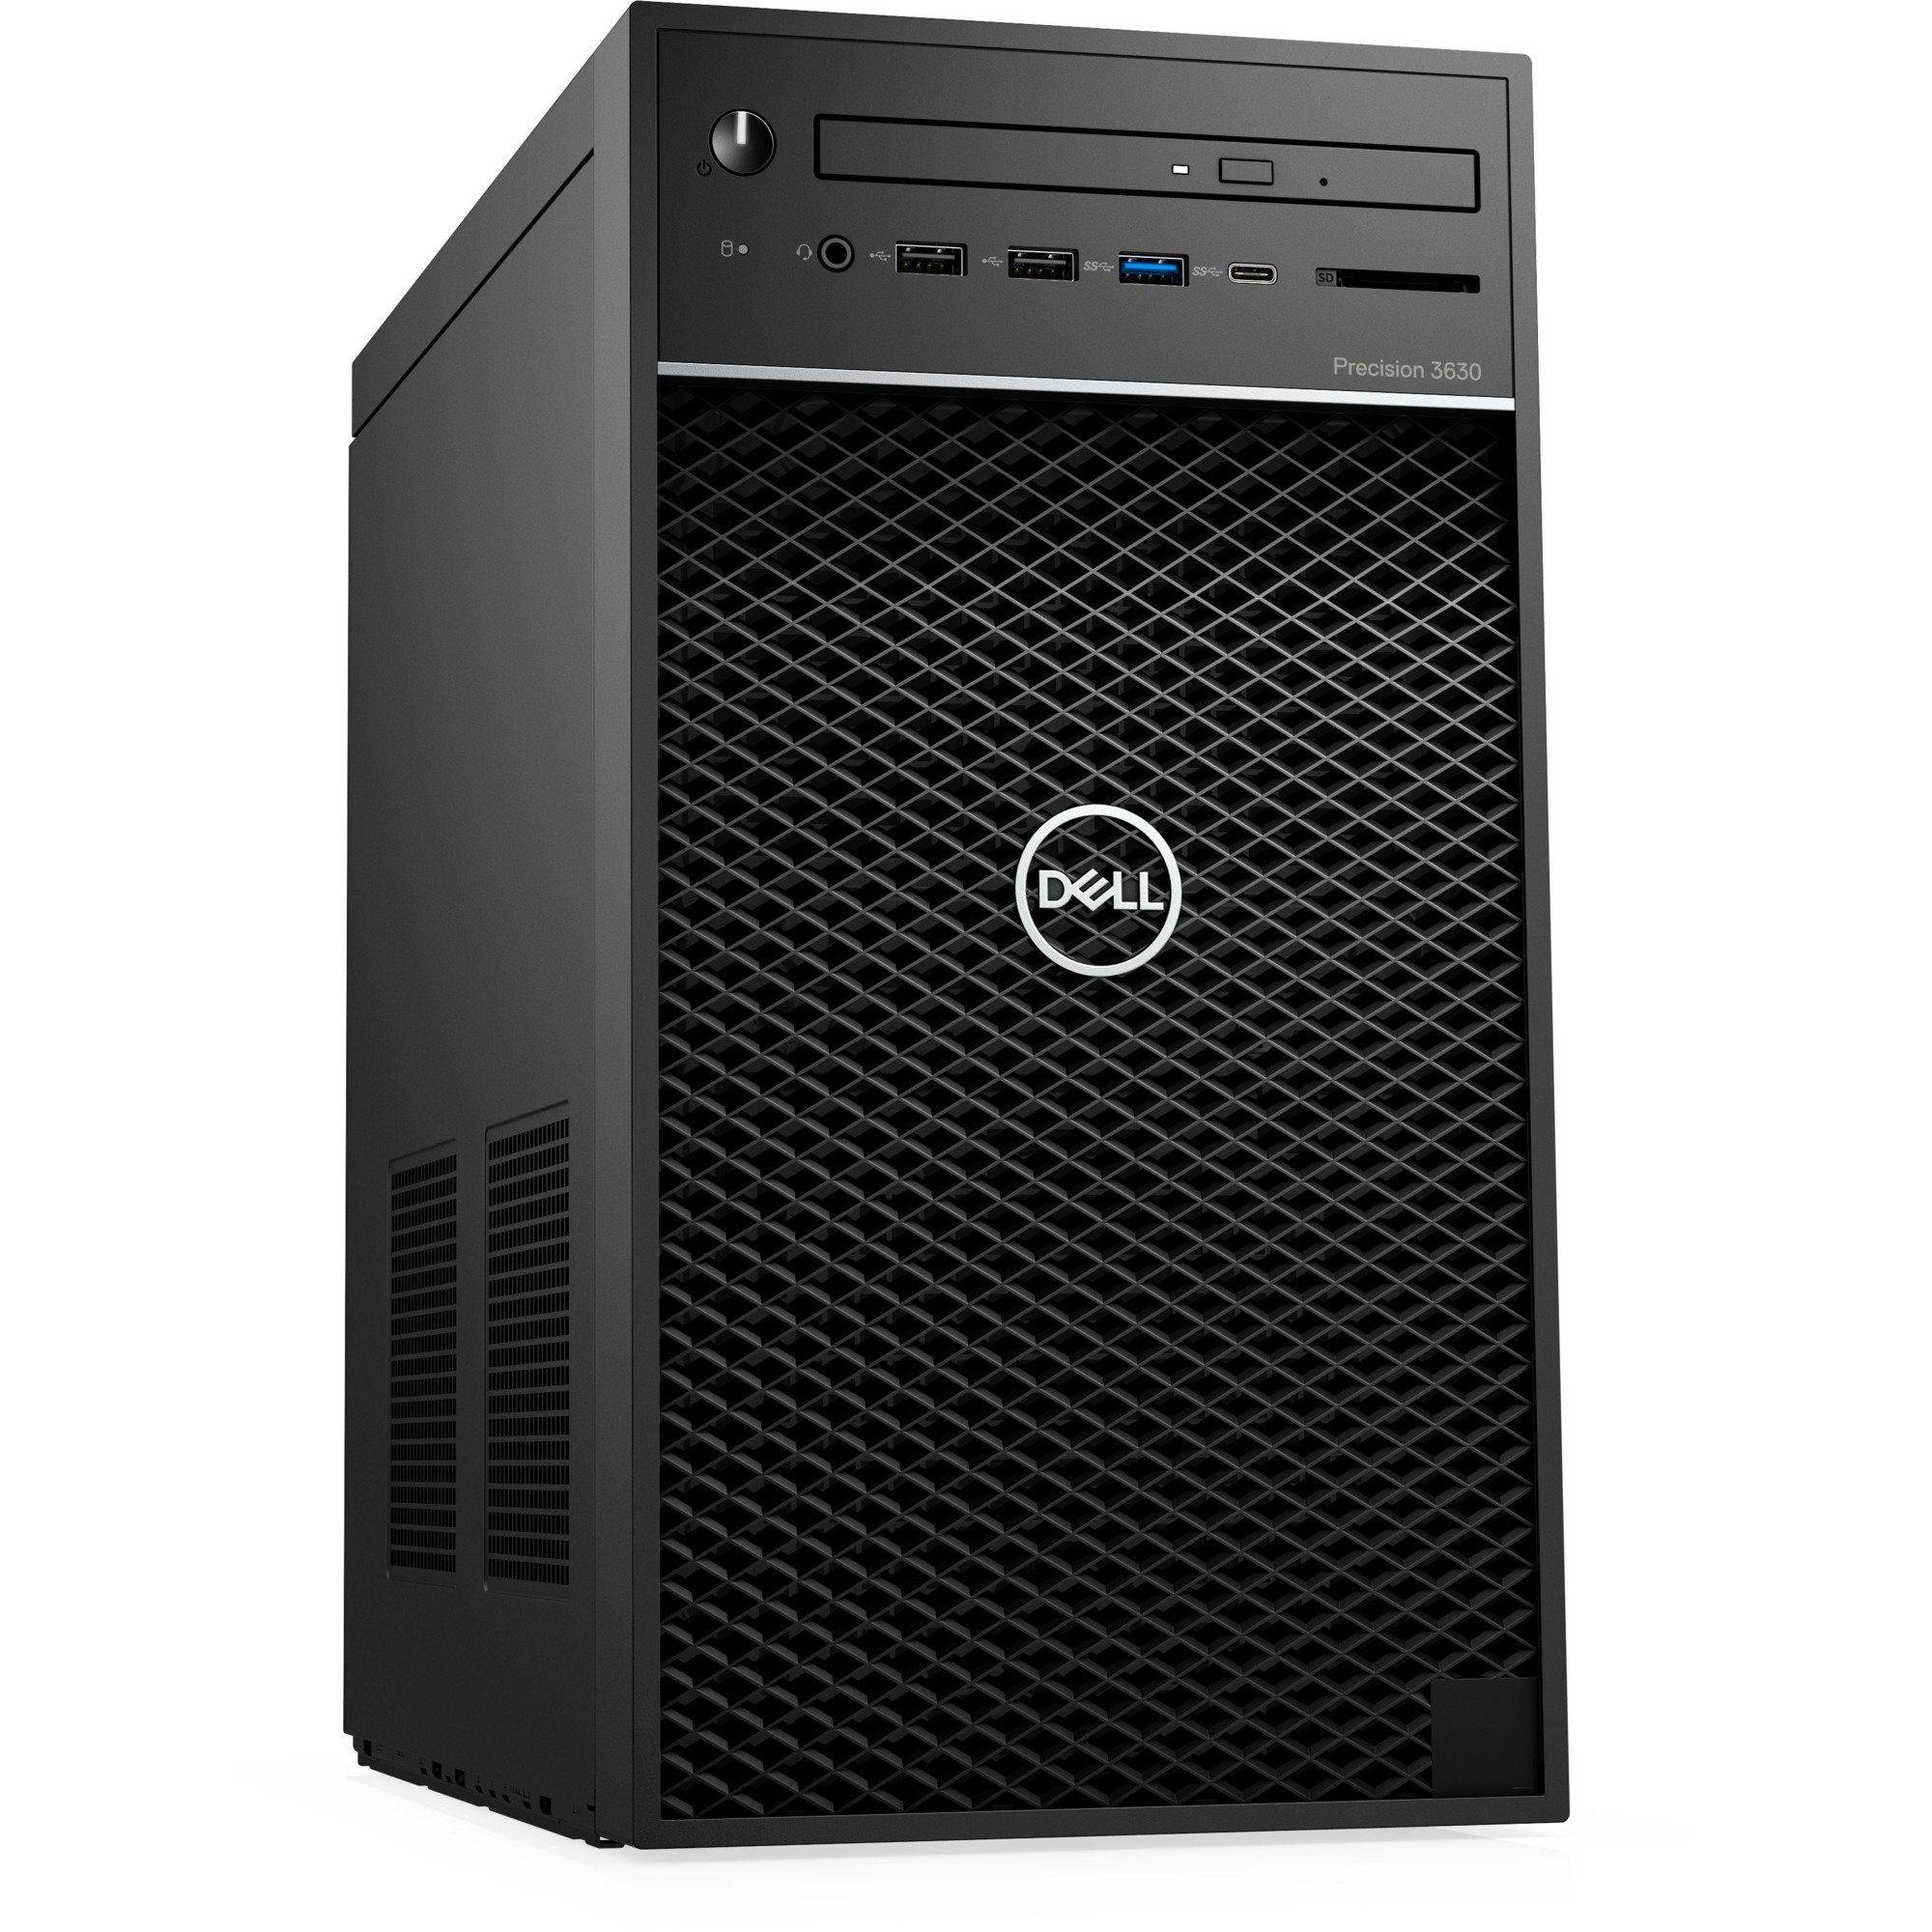 Dell Komplett-PC »Precision 3630 Tower, Windows 10 Pro 64-Bit«